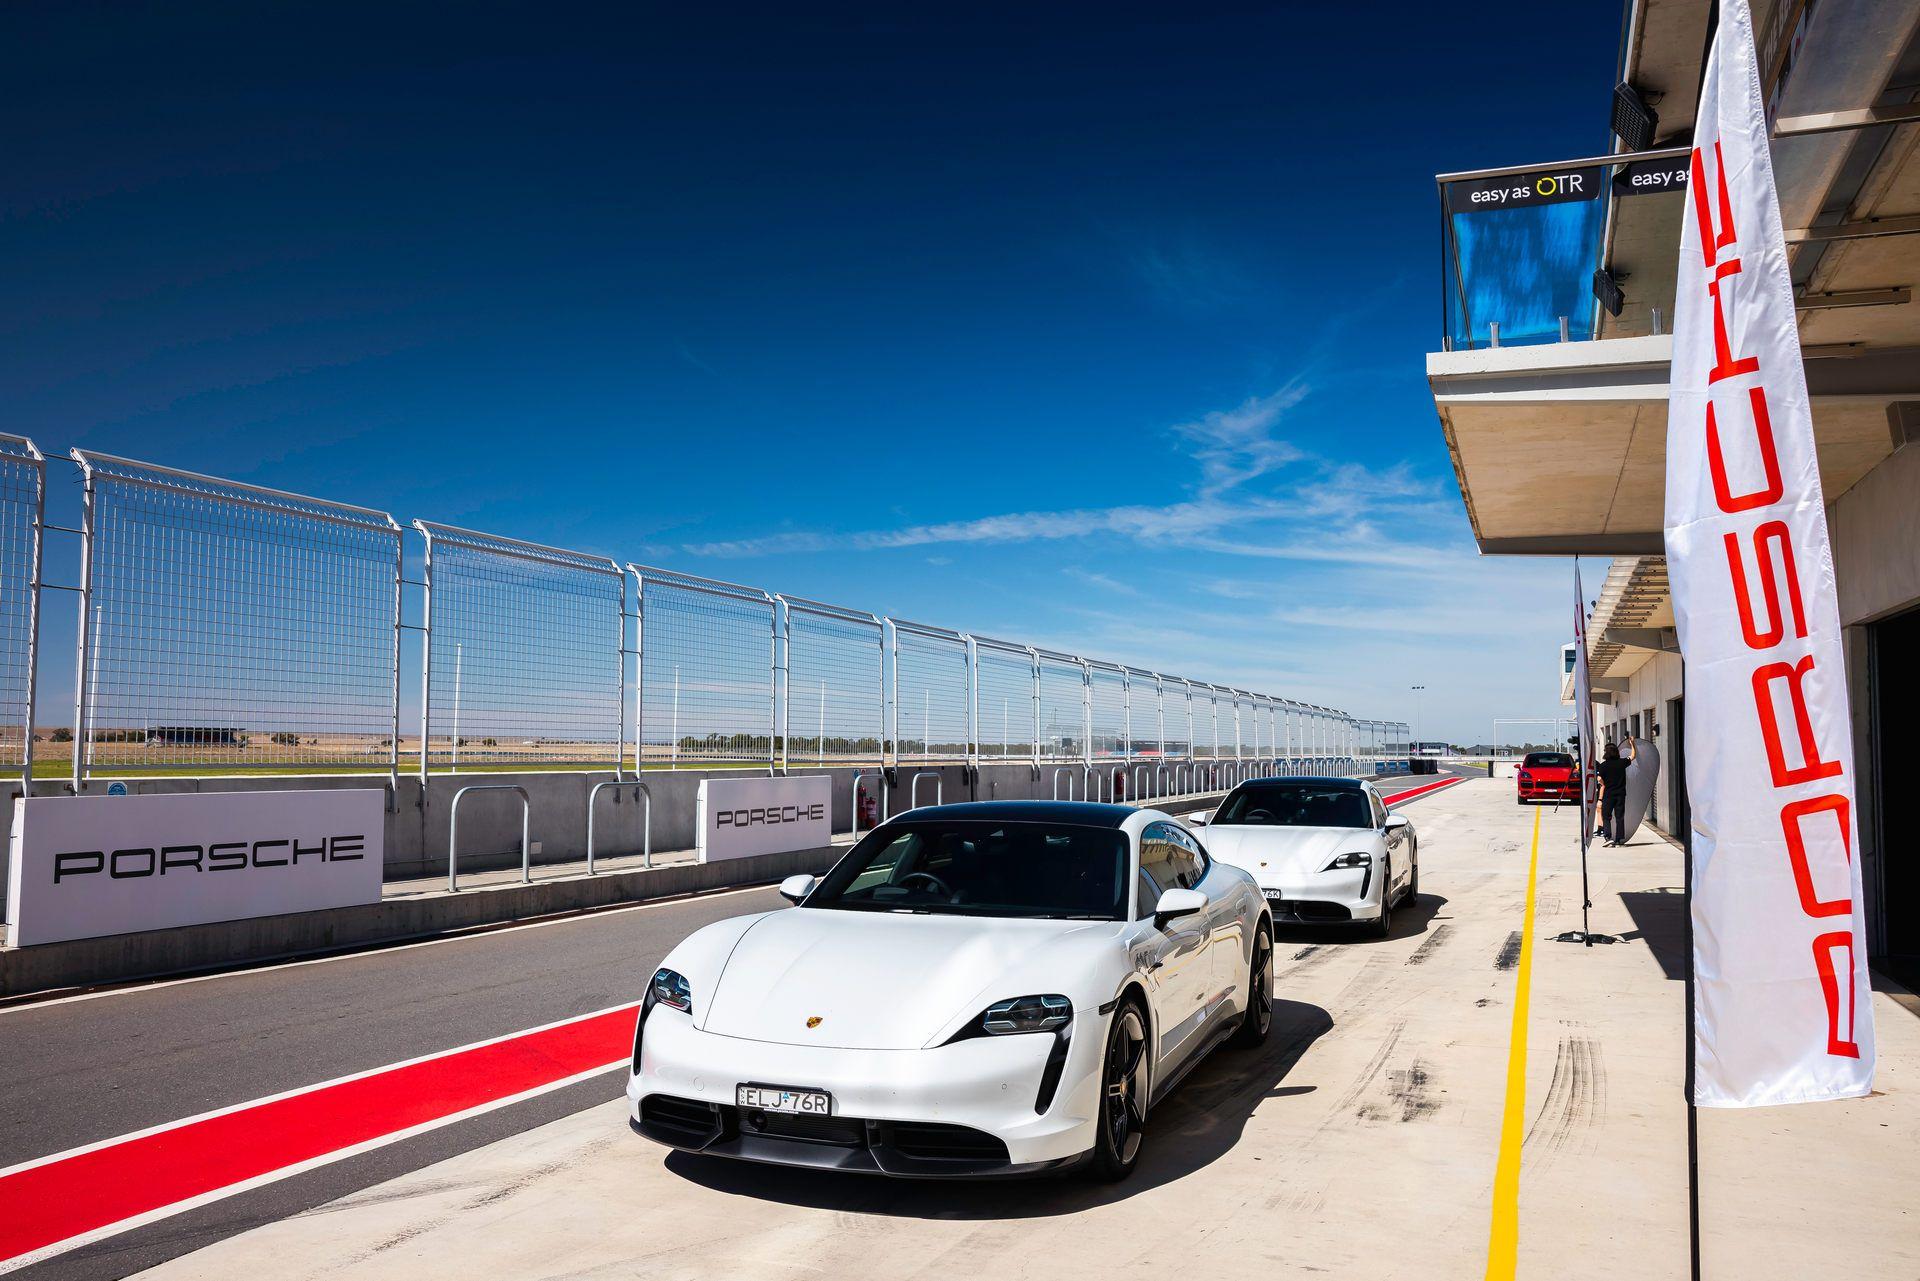 Porsche-Taycan-Turbo-S-The-Bend-Motorsport-Park-15